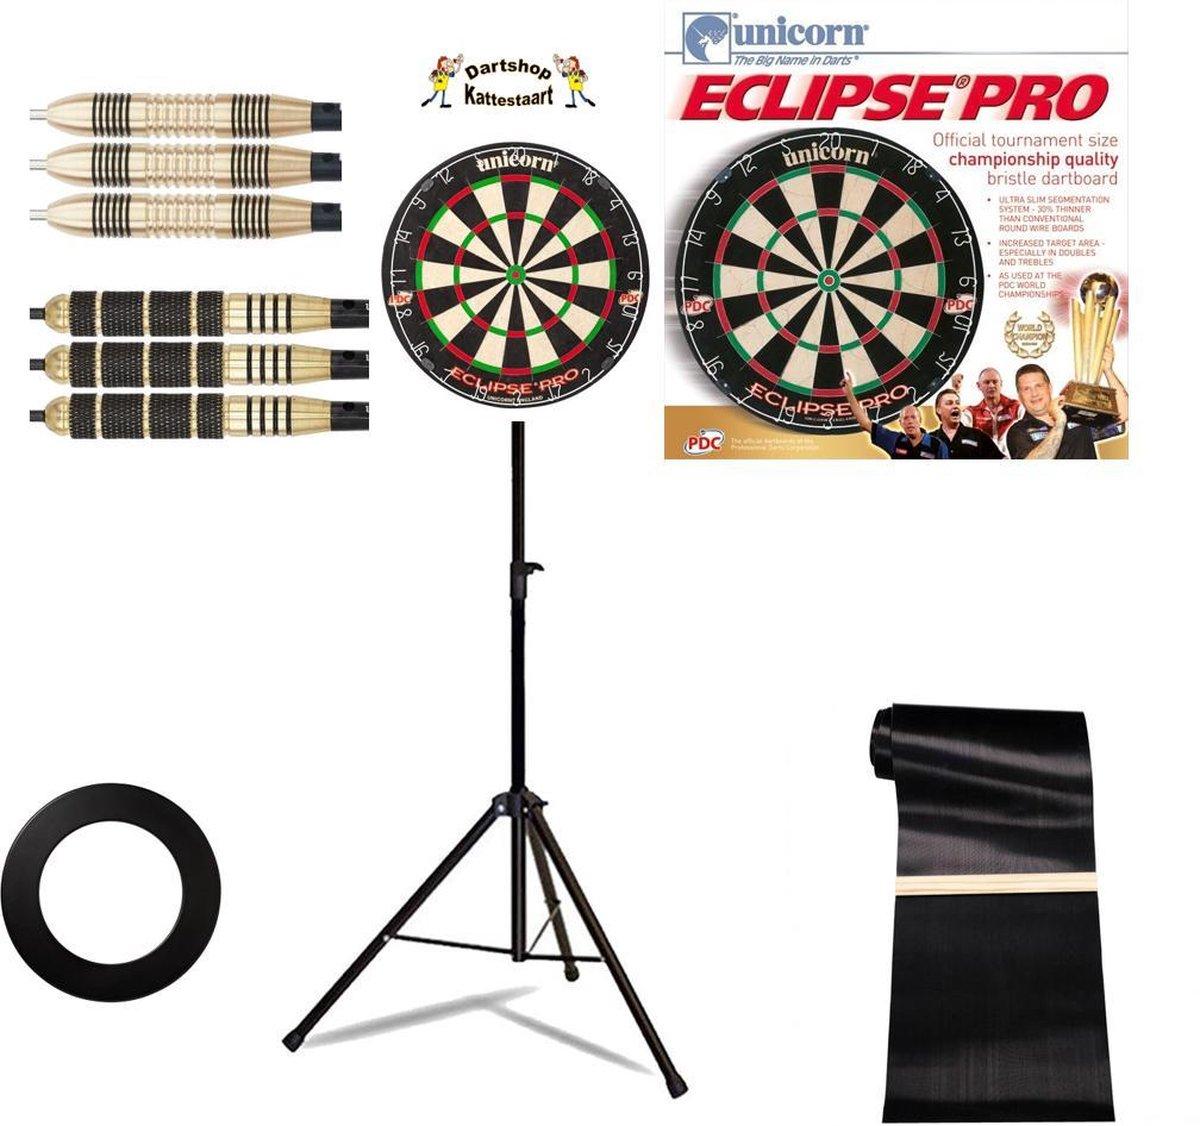 Unicorn Eclipse Pro DartSET Deluxe incl Dartstandaard & 6 darts + Surround Ring Zwart + Rubberen Ochemat